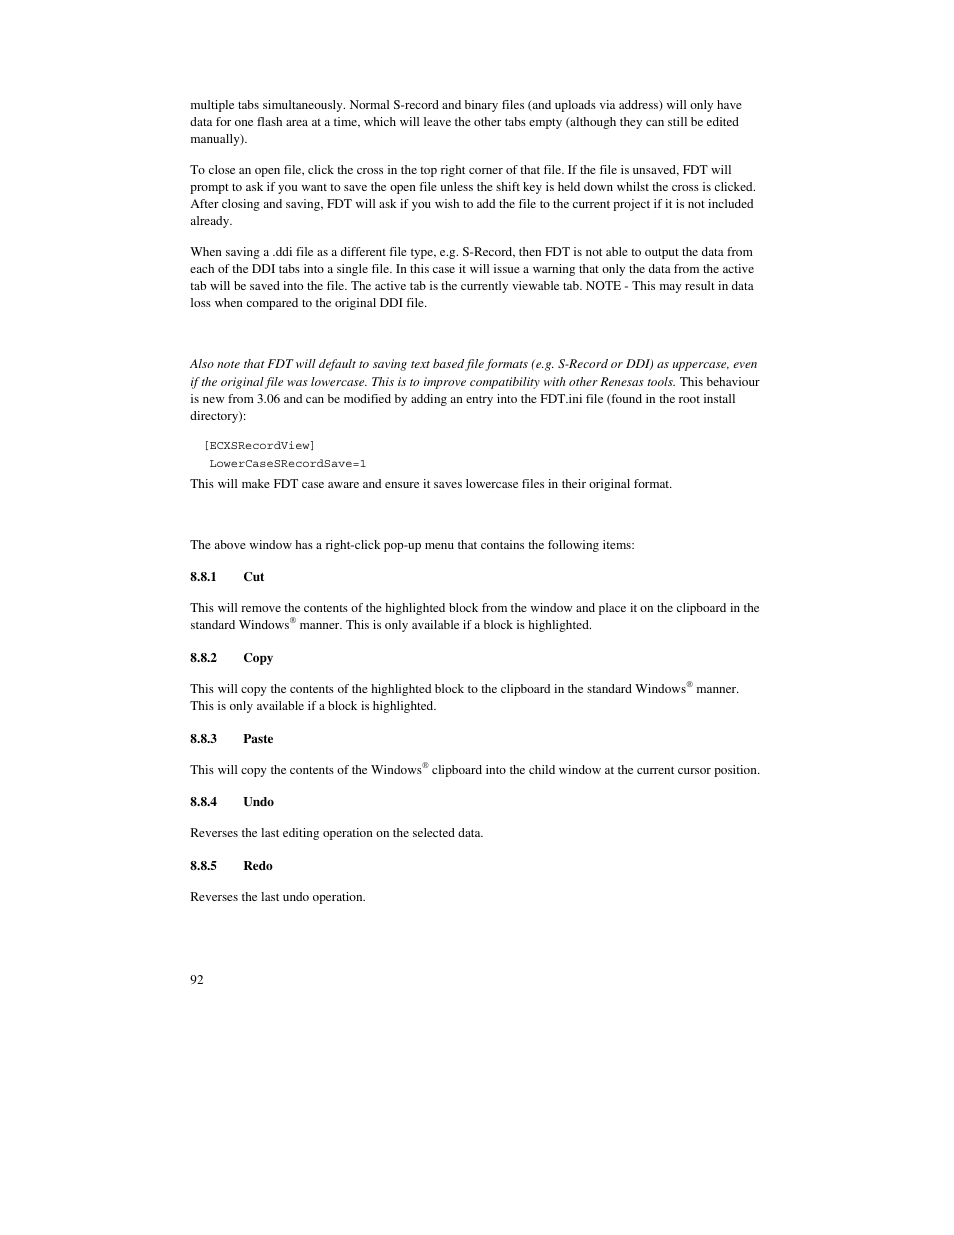 1 cut, 2 copy, 3 paste | Renesas FLASH Development Toolkit 3.07 User Manual  | Page 106 / 146